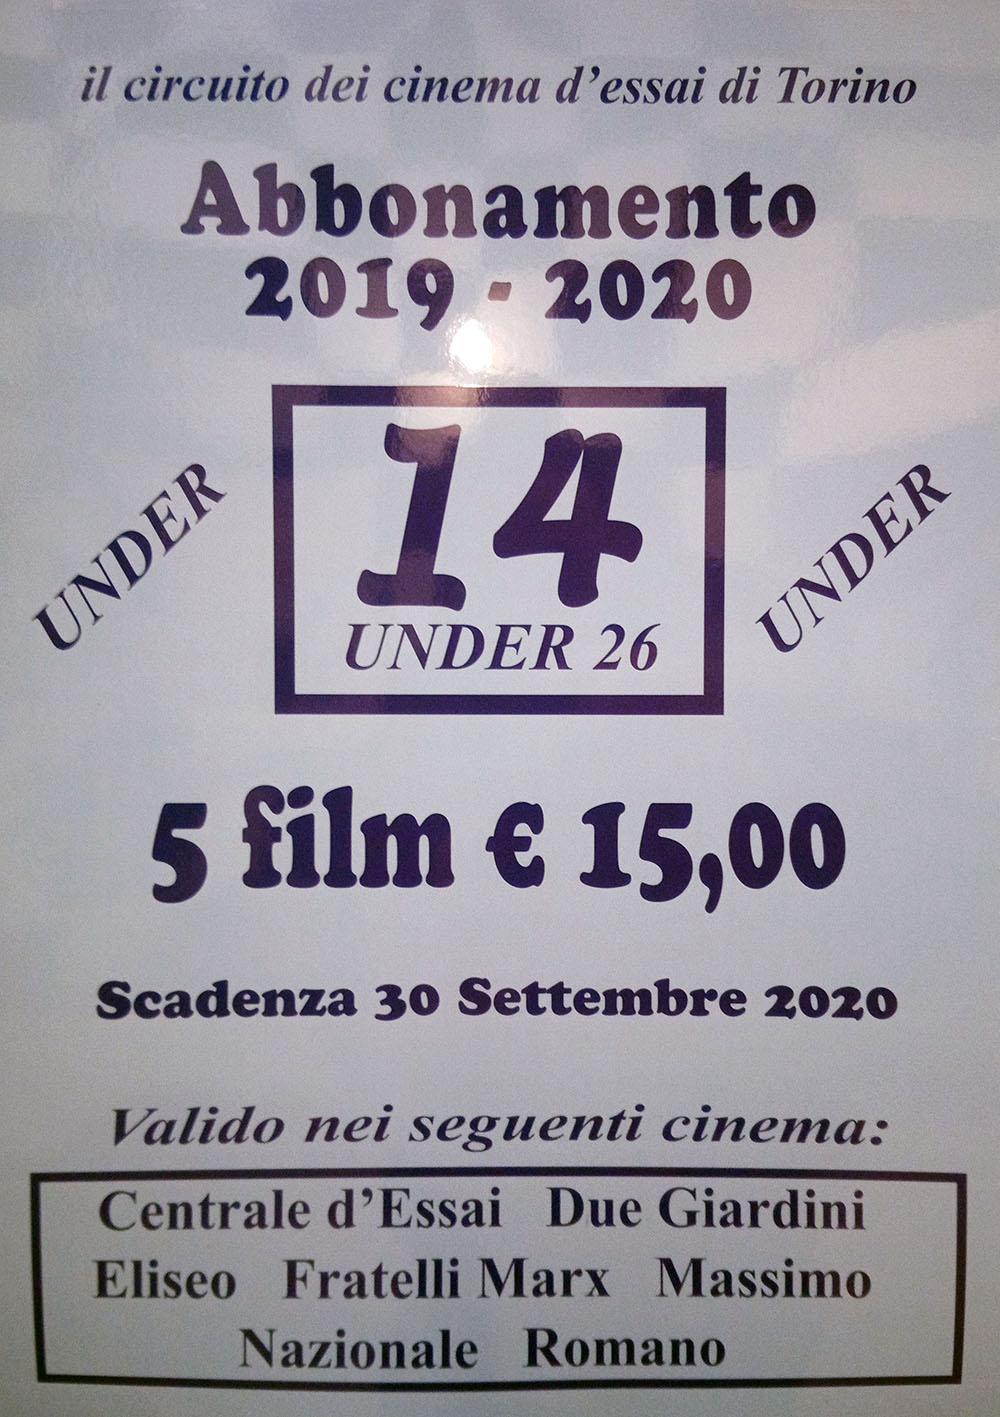 Abbonamento under 26